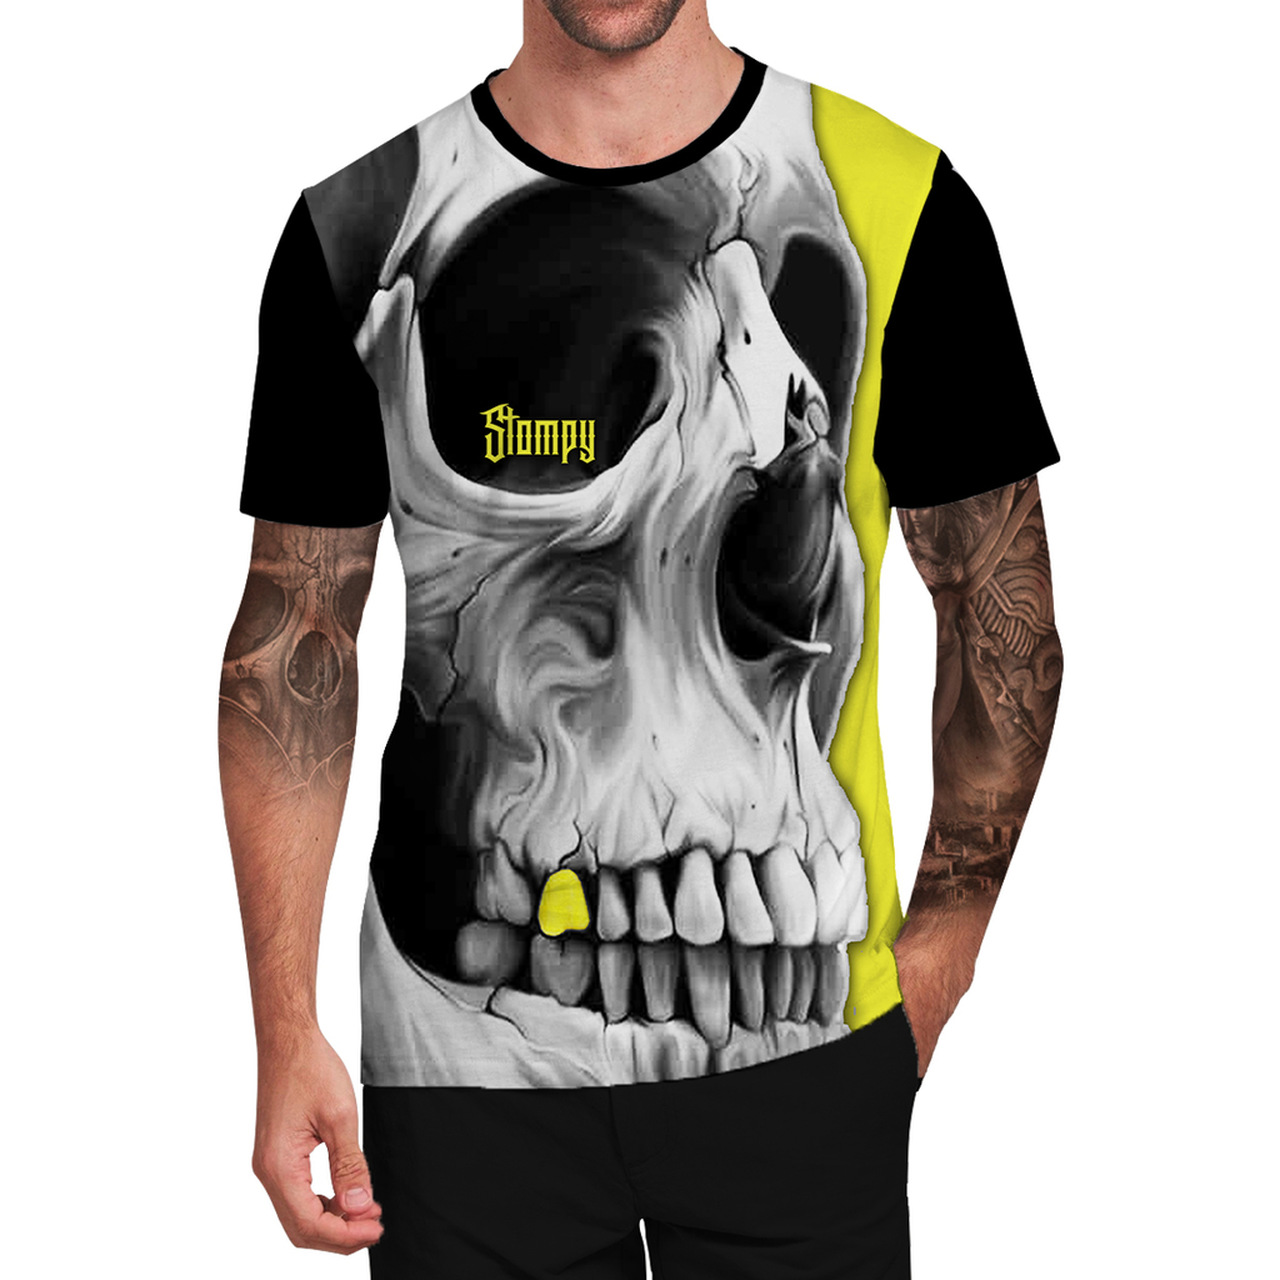 Stompy Camiseta Tattoo Tatuagem Caveira Skull 77